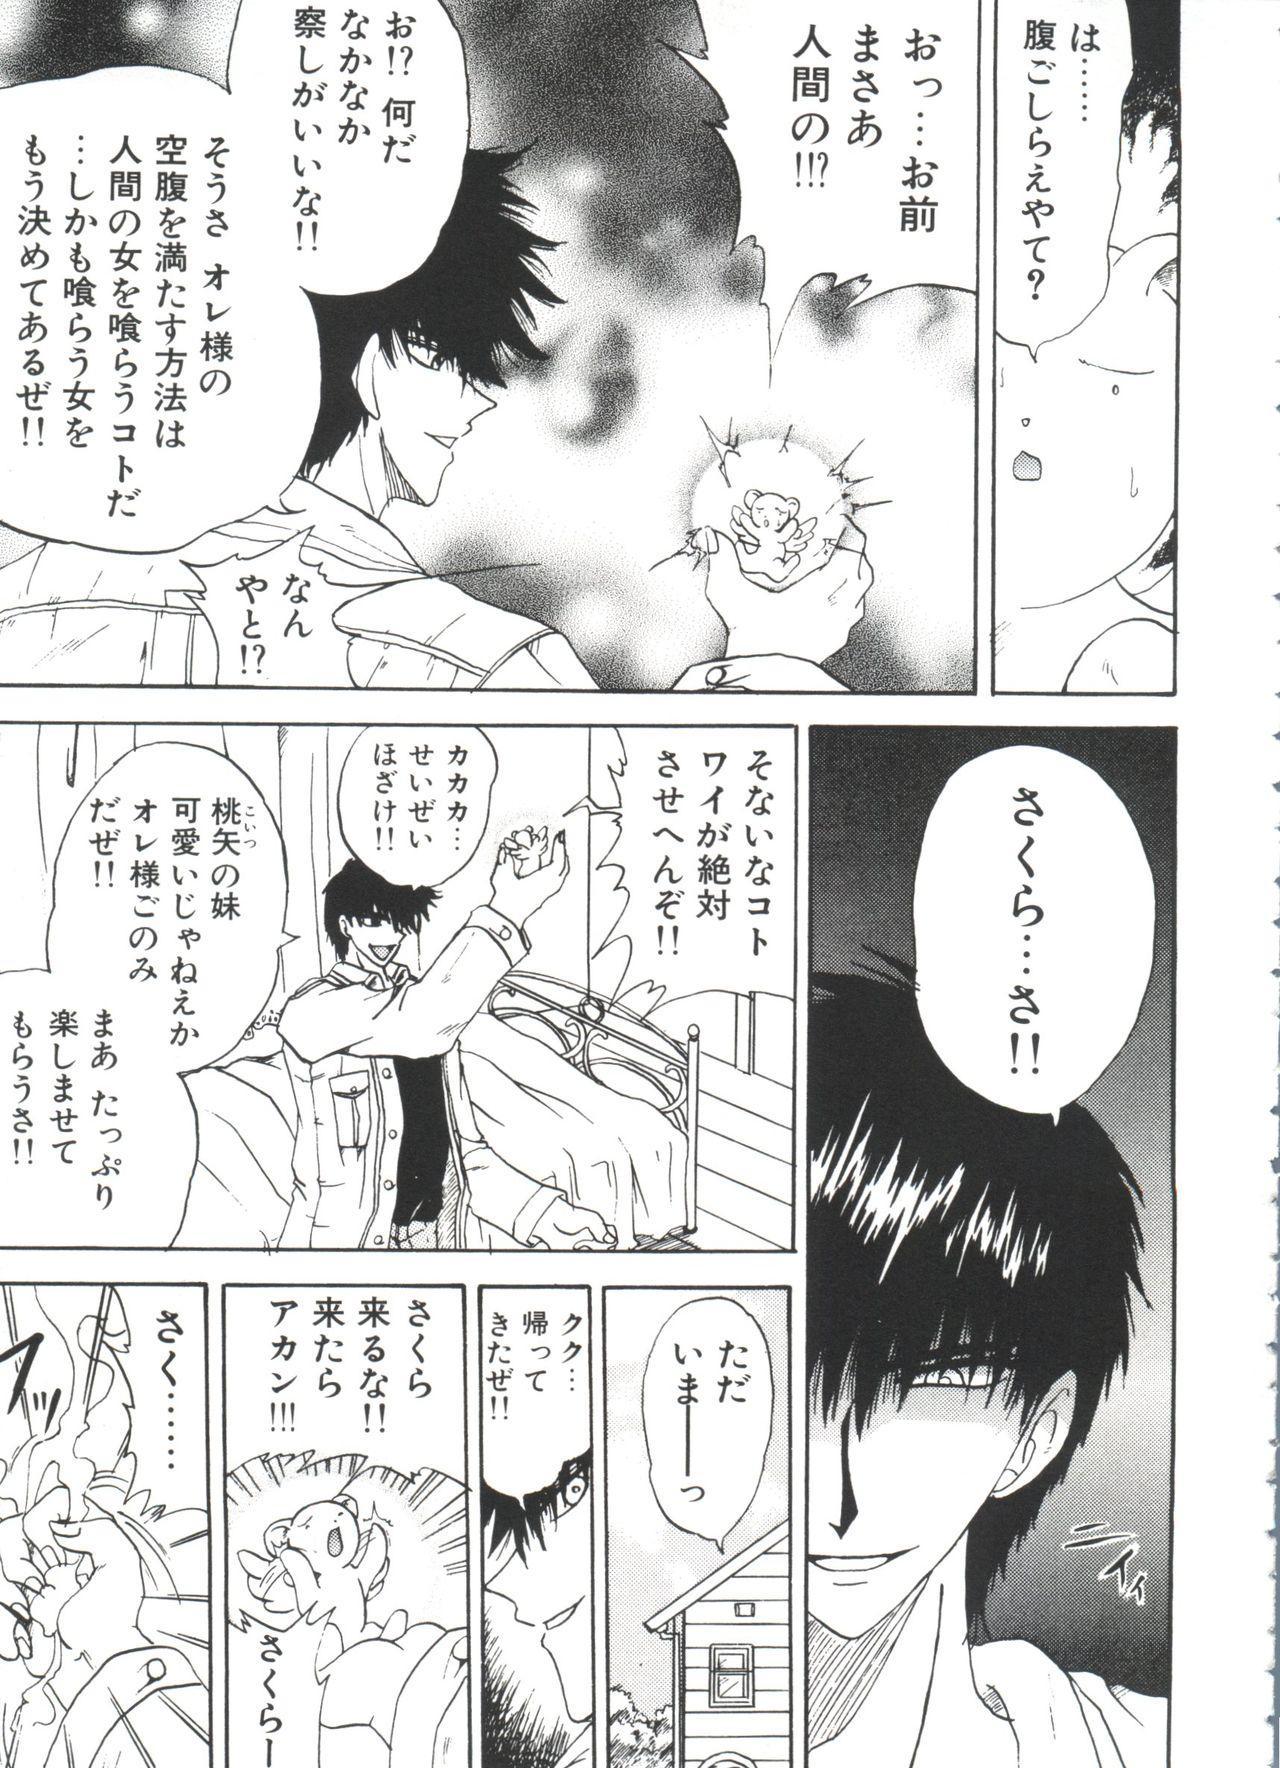 Ero-chan to Issho 2 104